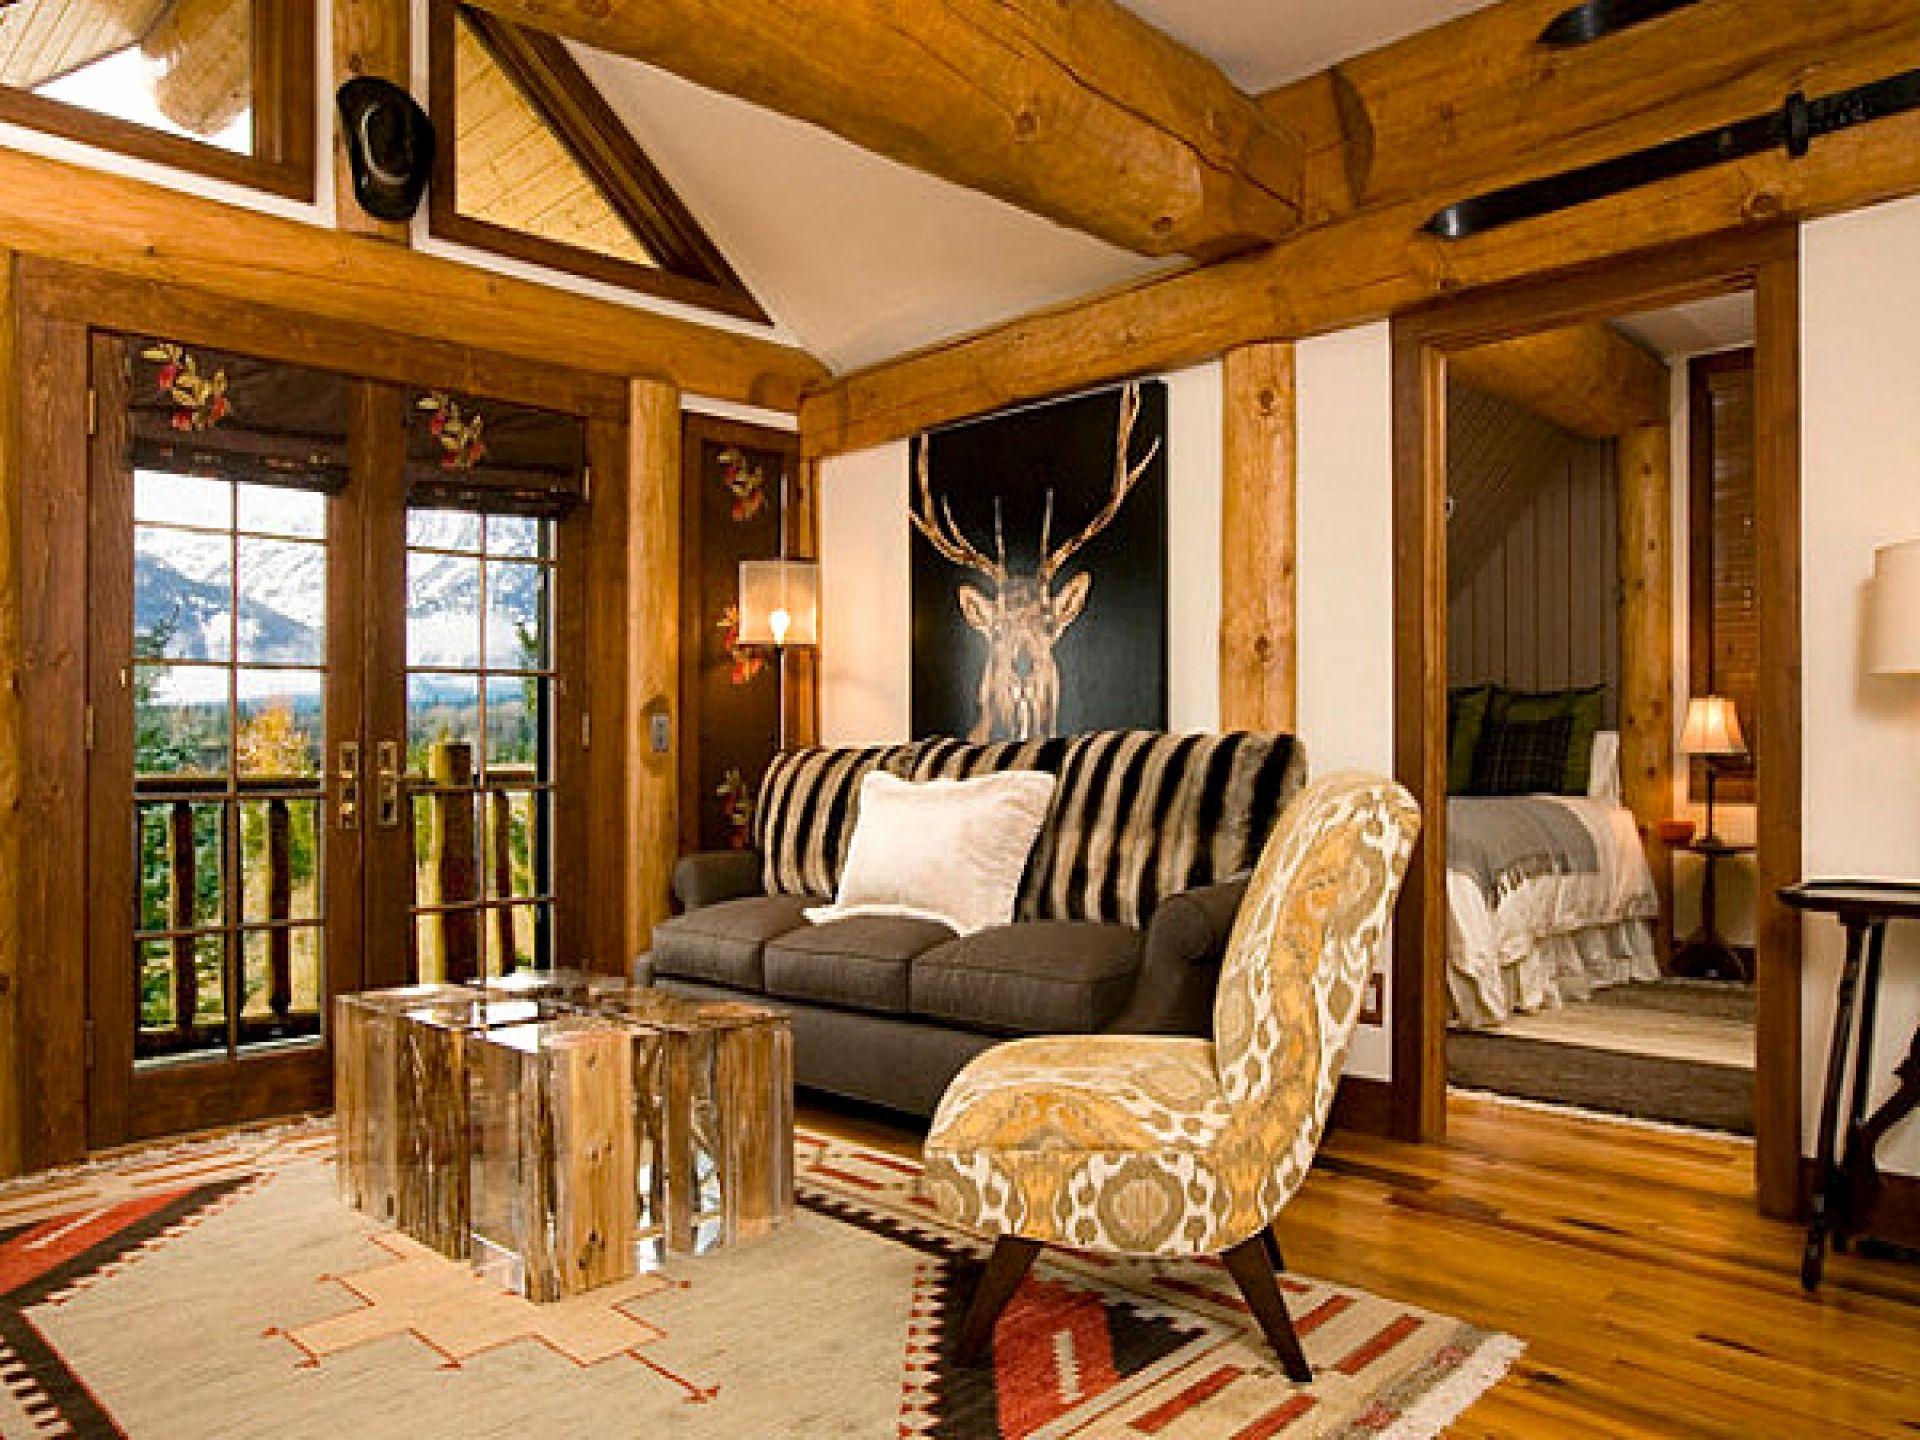 Modern Rustic Living Room Ideas Beautiful Interior Design Blog Beautiful Modern Rustic Ho Living Room Decor Rustic Rustic Living Room Design Rustic Living Room